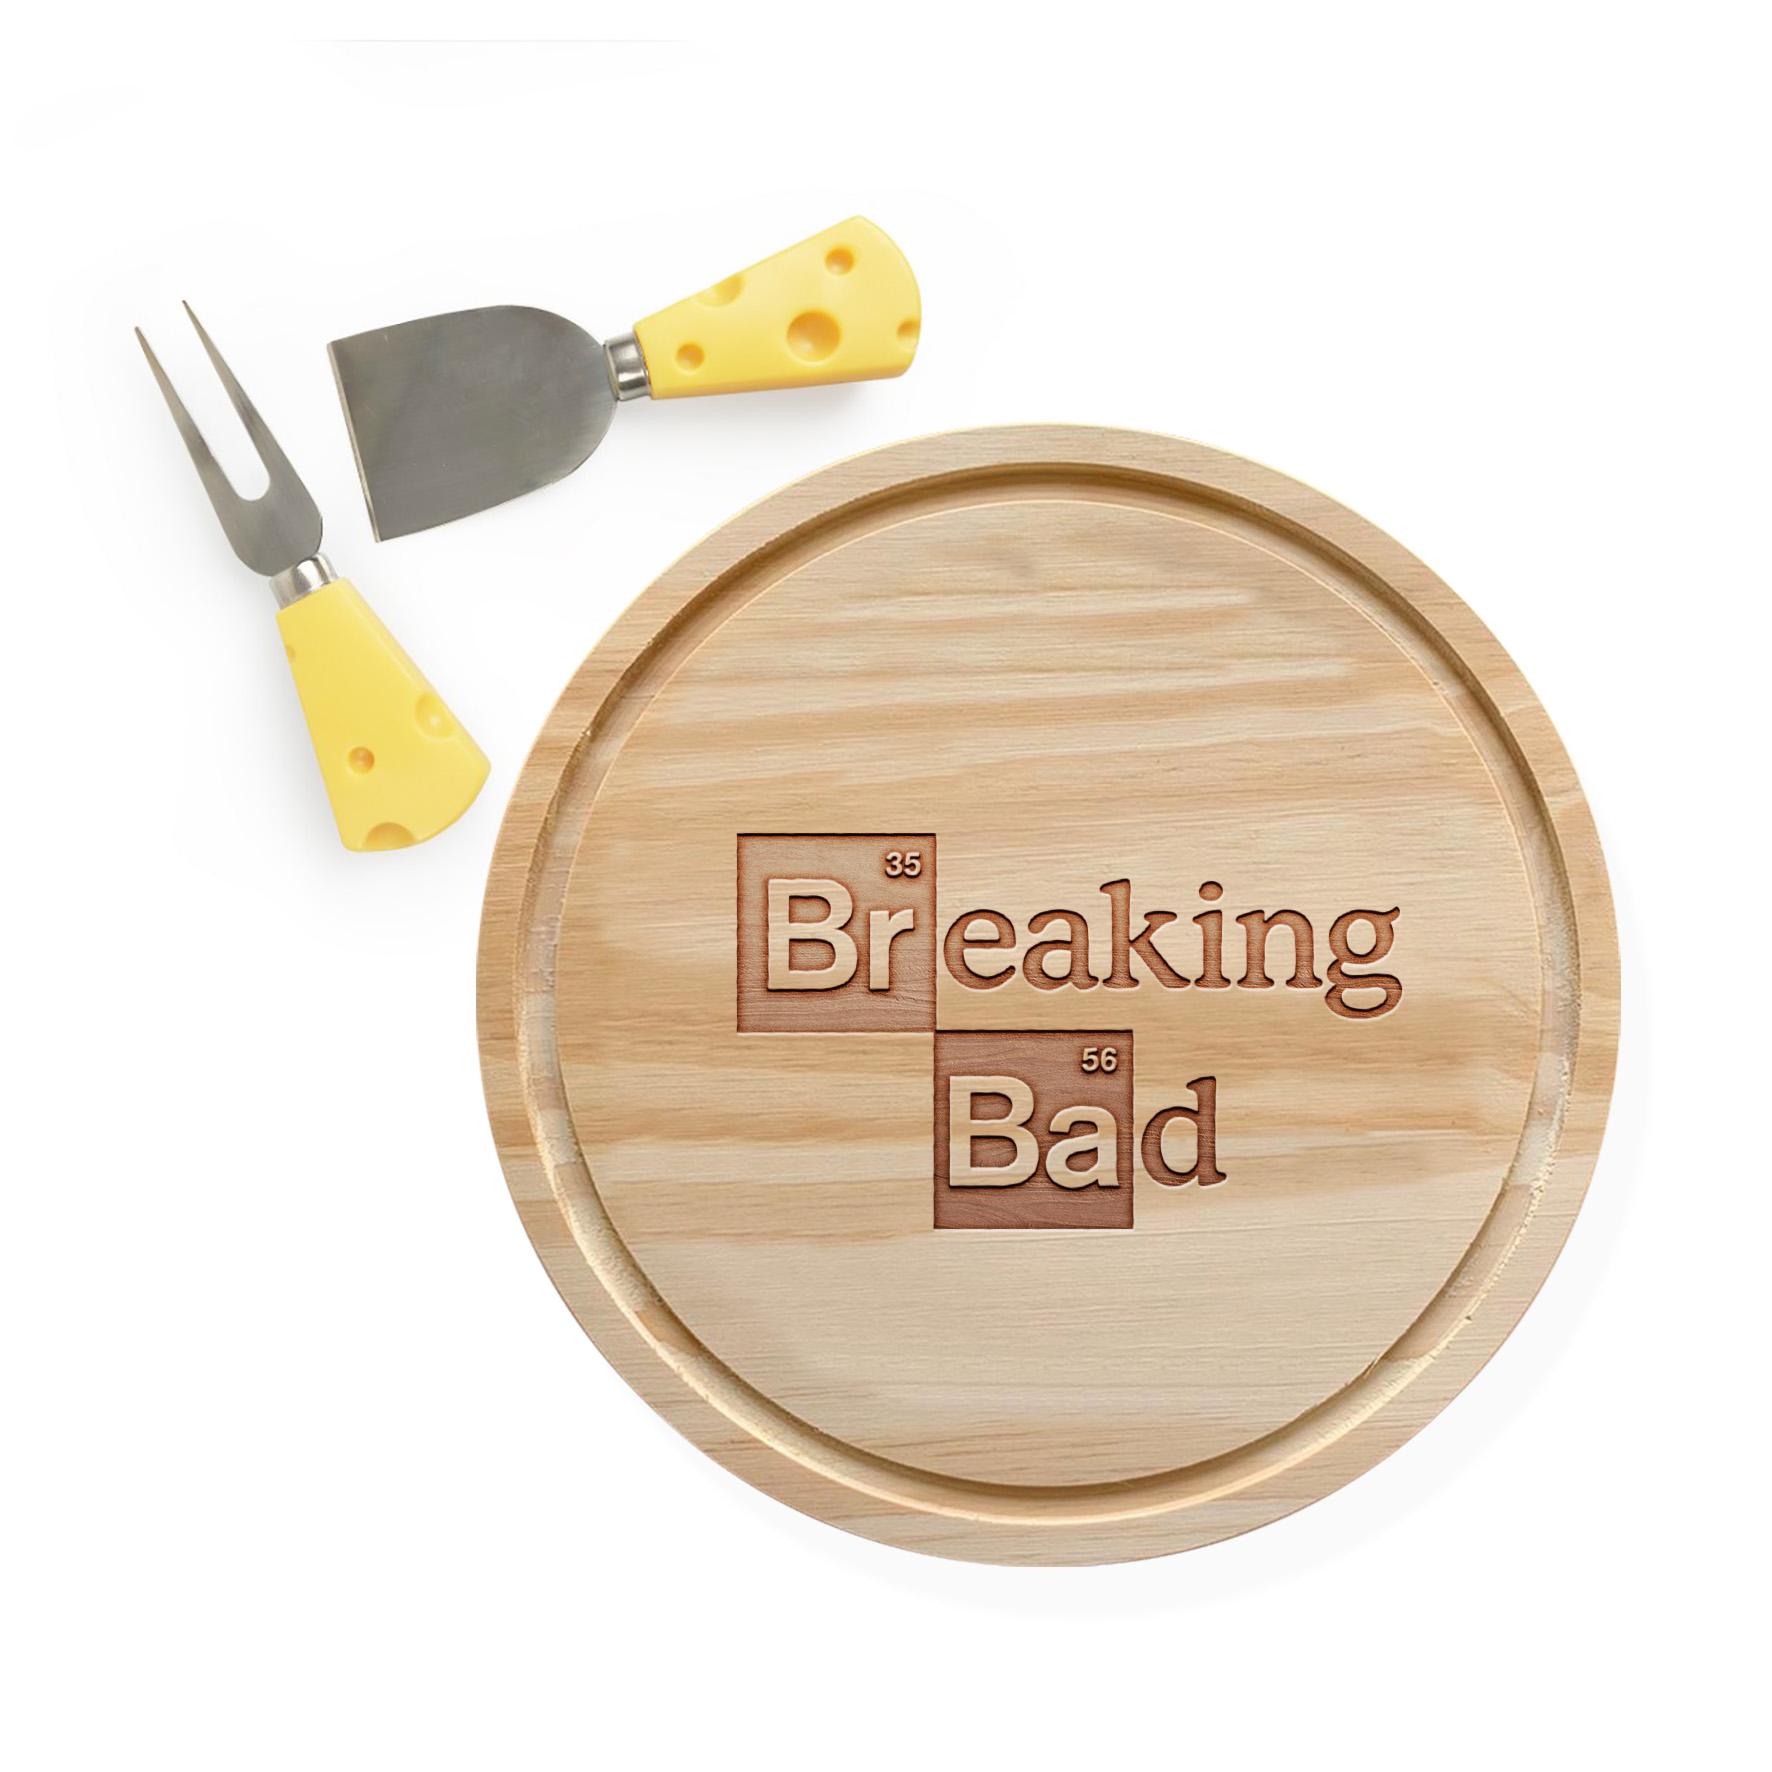 Tábua de Madeira e Espátula de Queijo Breaking Bad Logo Netflix - EV